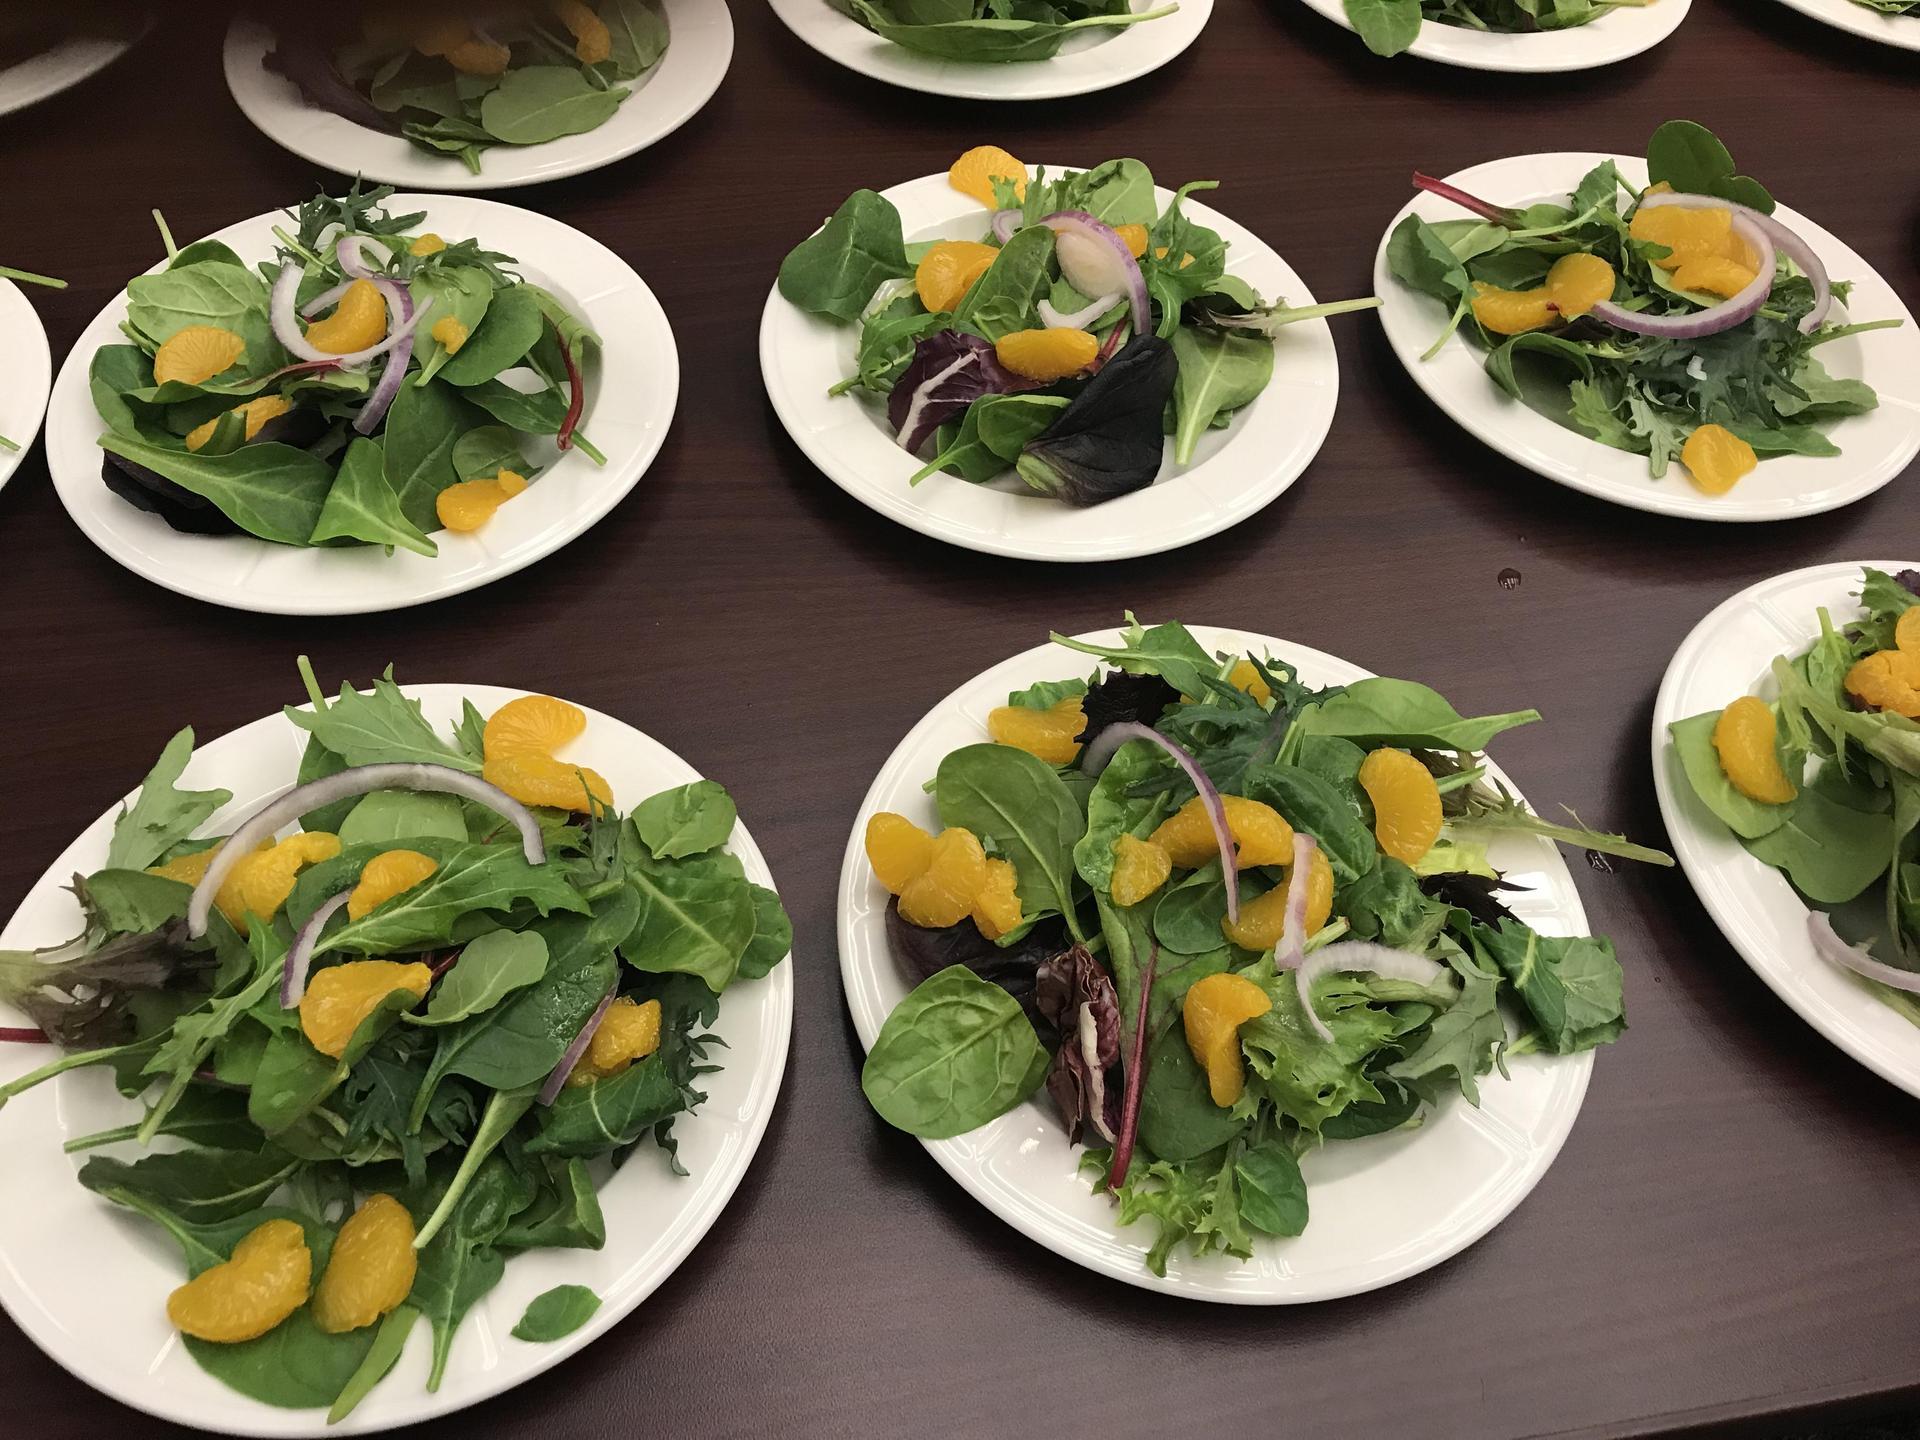 served salad